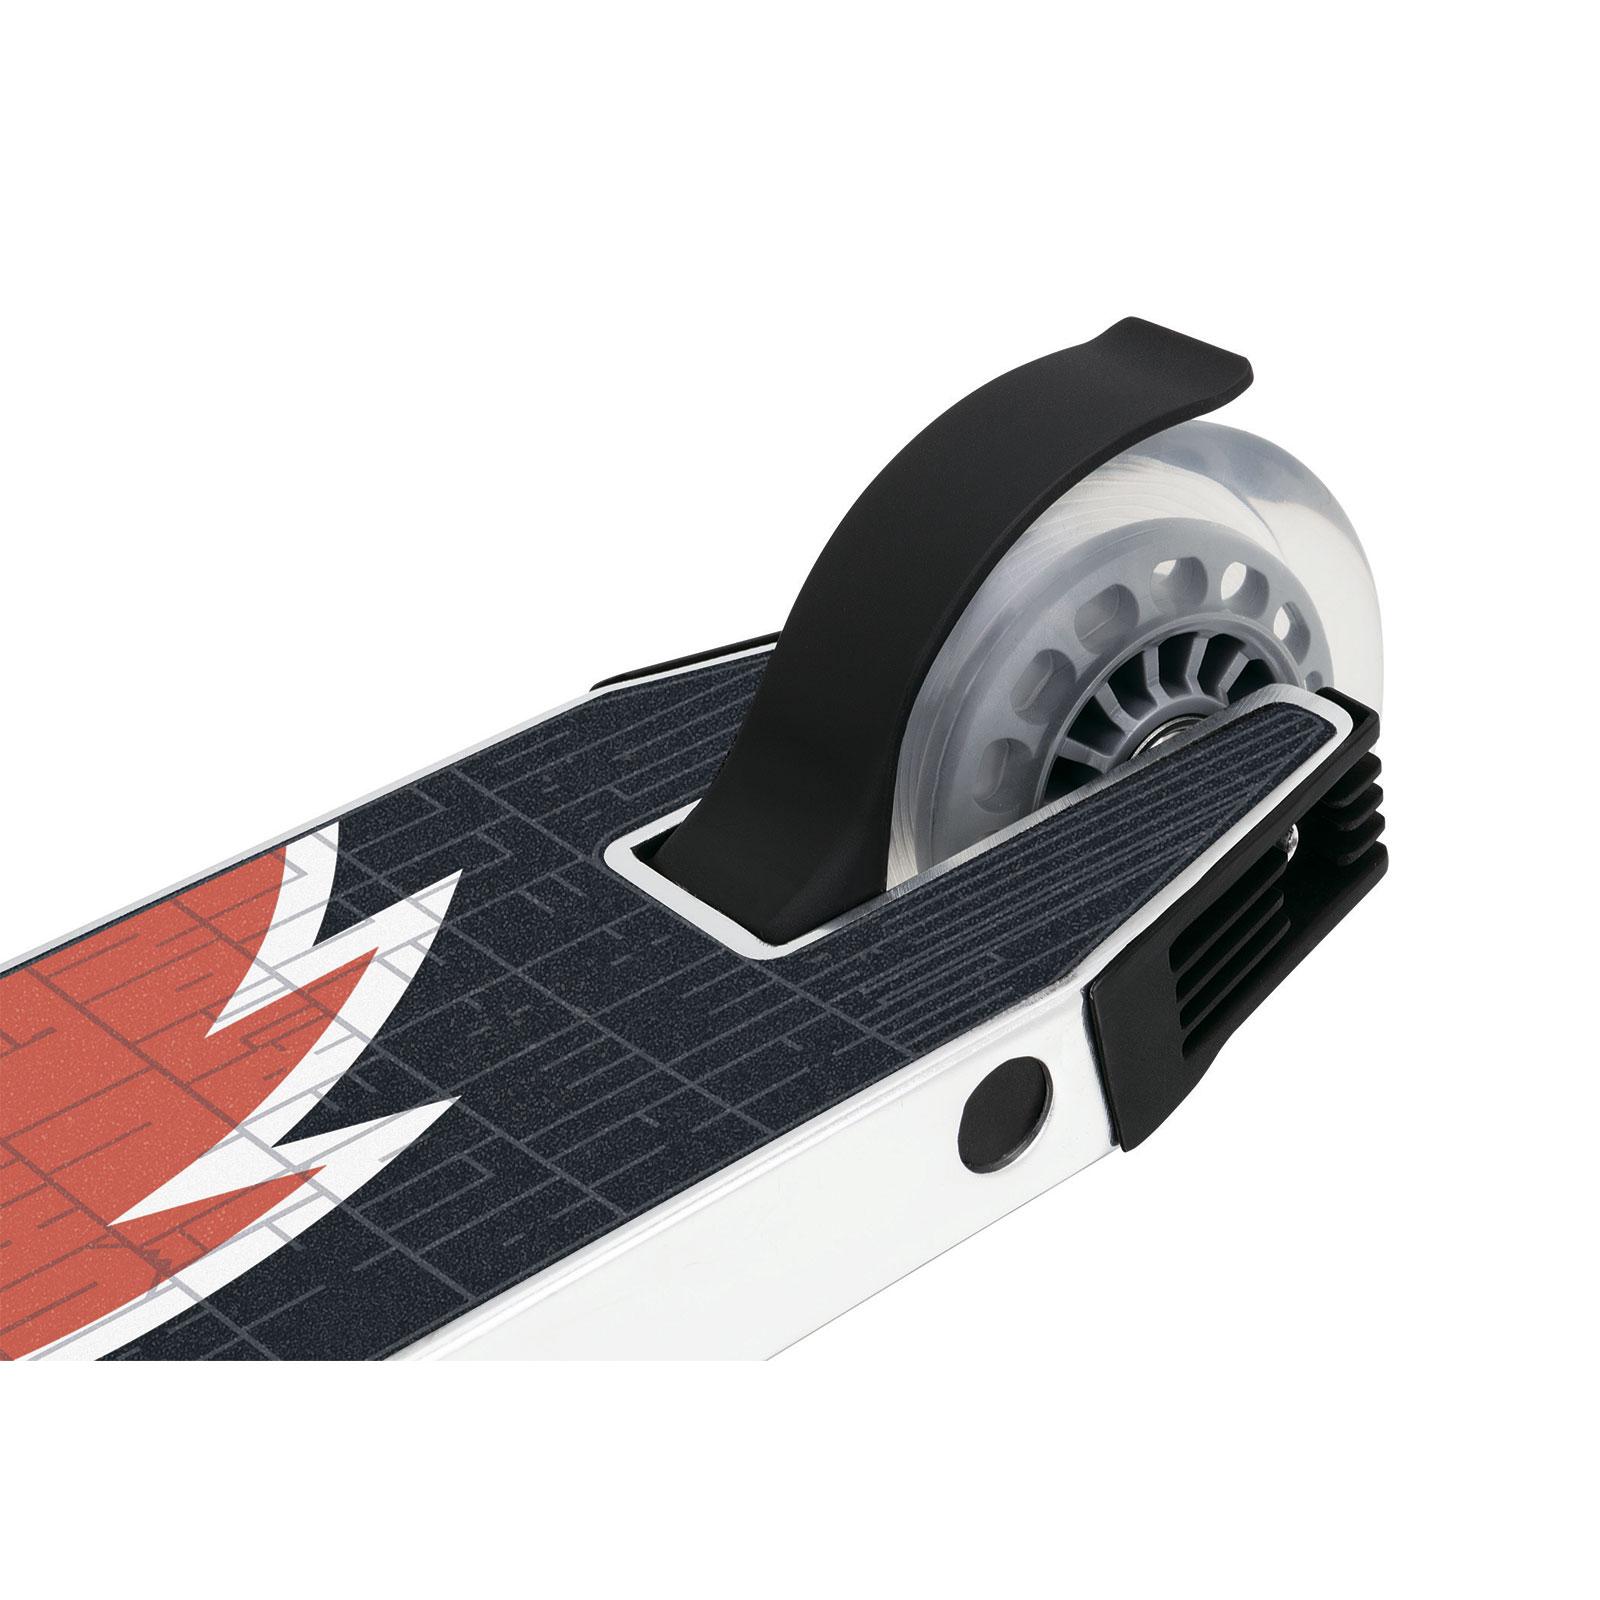 ������� ��� ������ Razor Ultra Pro 2015